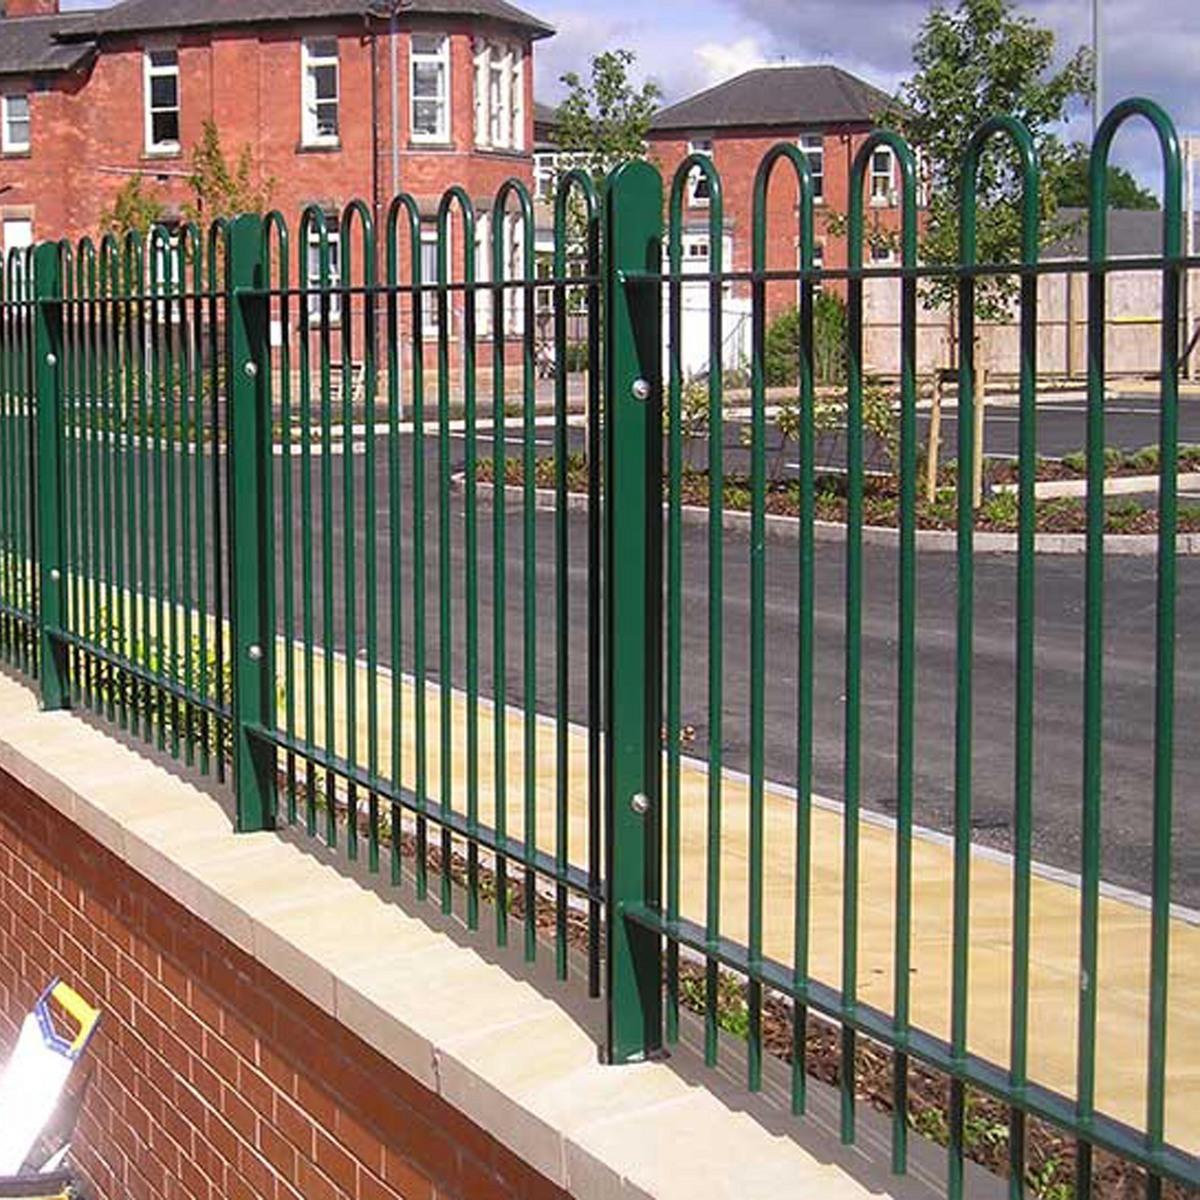 Railings-standard-bow-top-railings-highbury-vale-hospital-nottingham